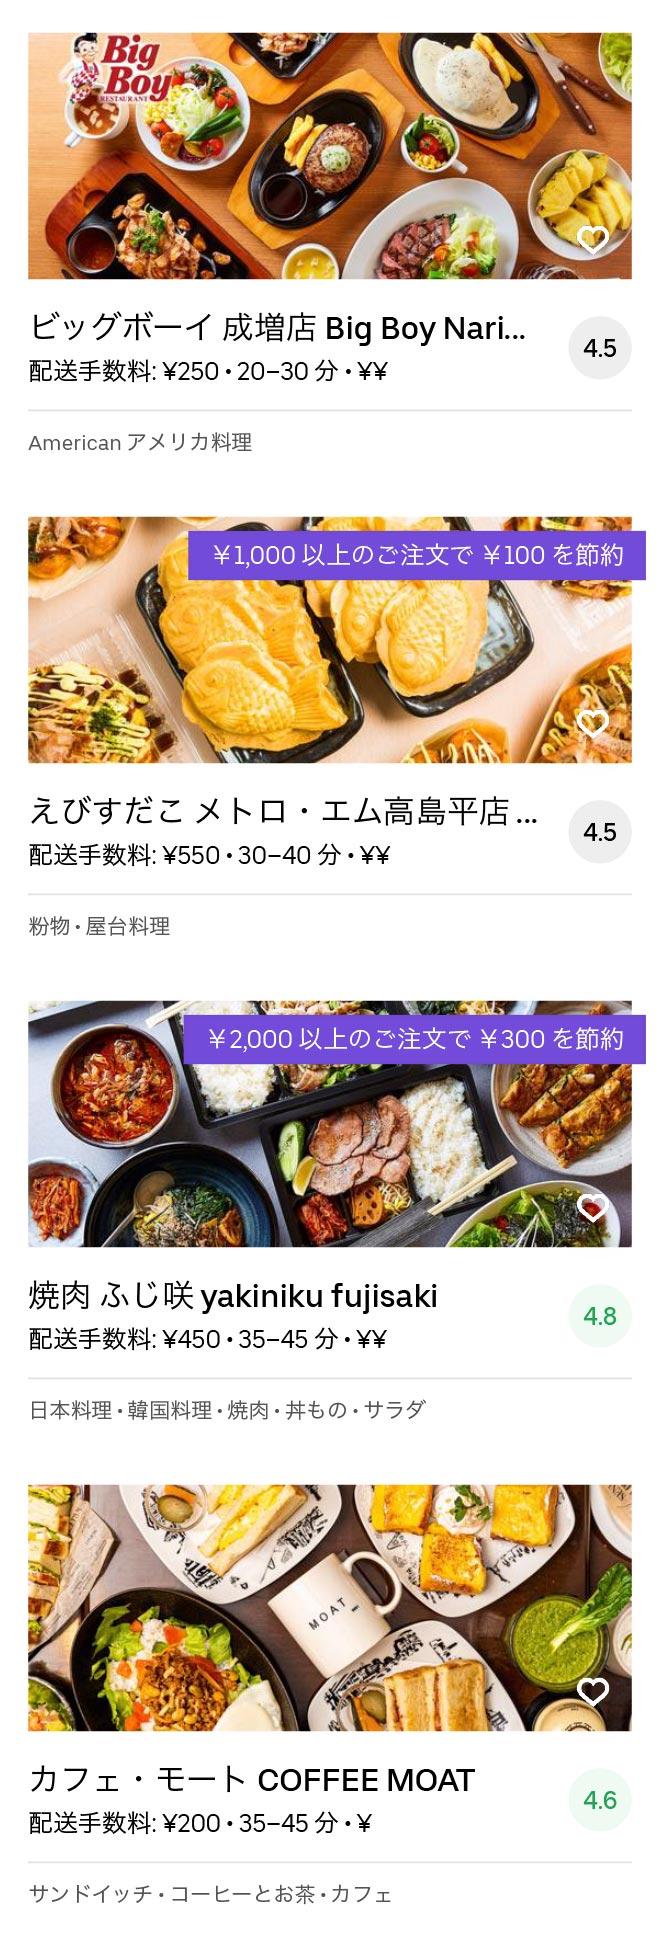 Saitama wako menu 2004 10